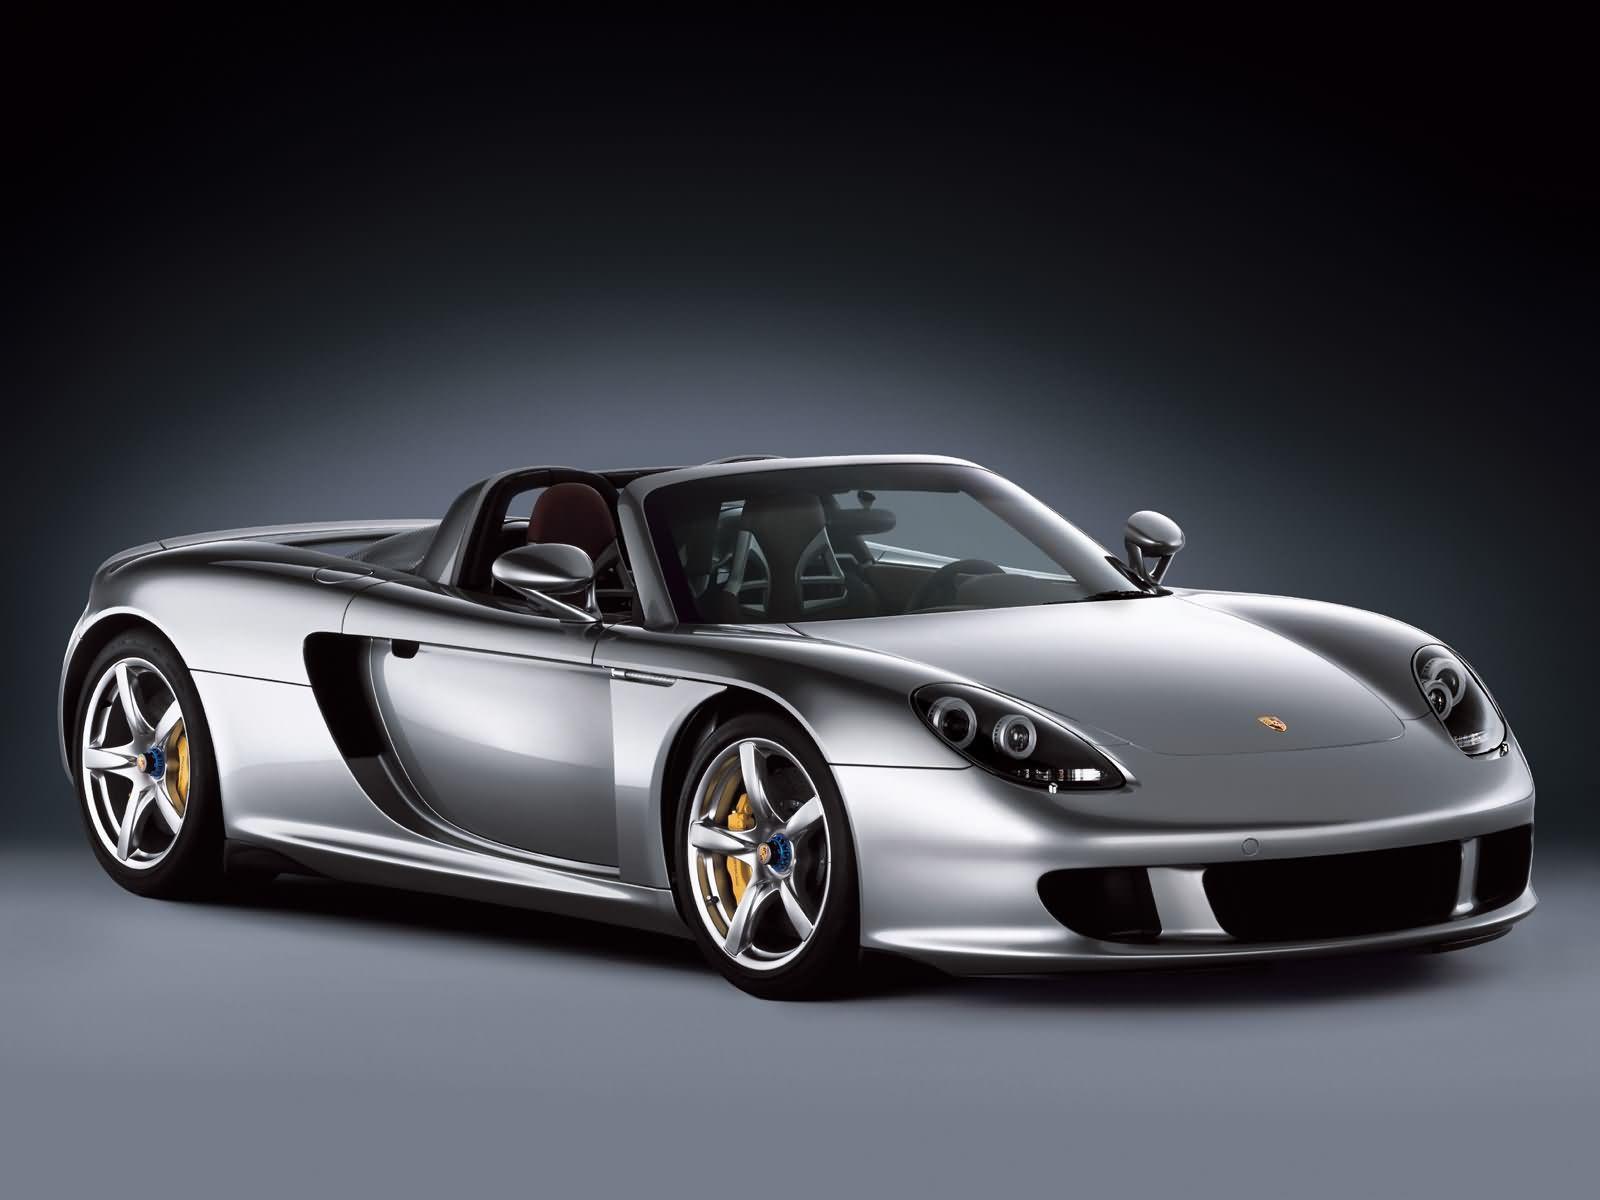 a867180983728f2838a40b3cf9c040b4 Interesting Hinh Anh Xe Porsche 918 Spyder Cars Trend